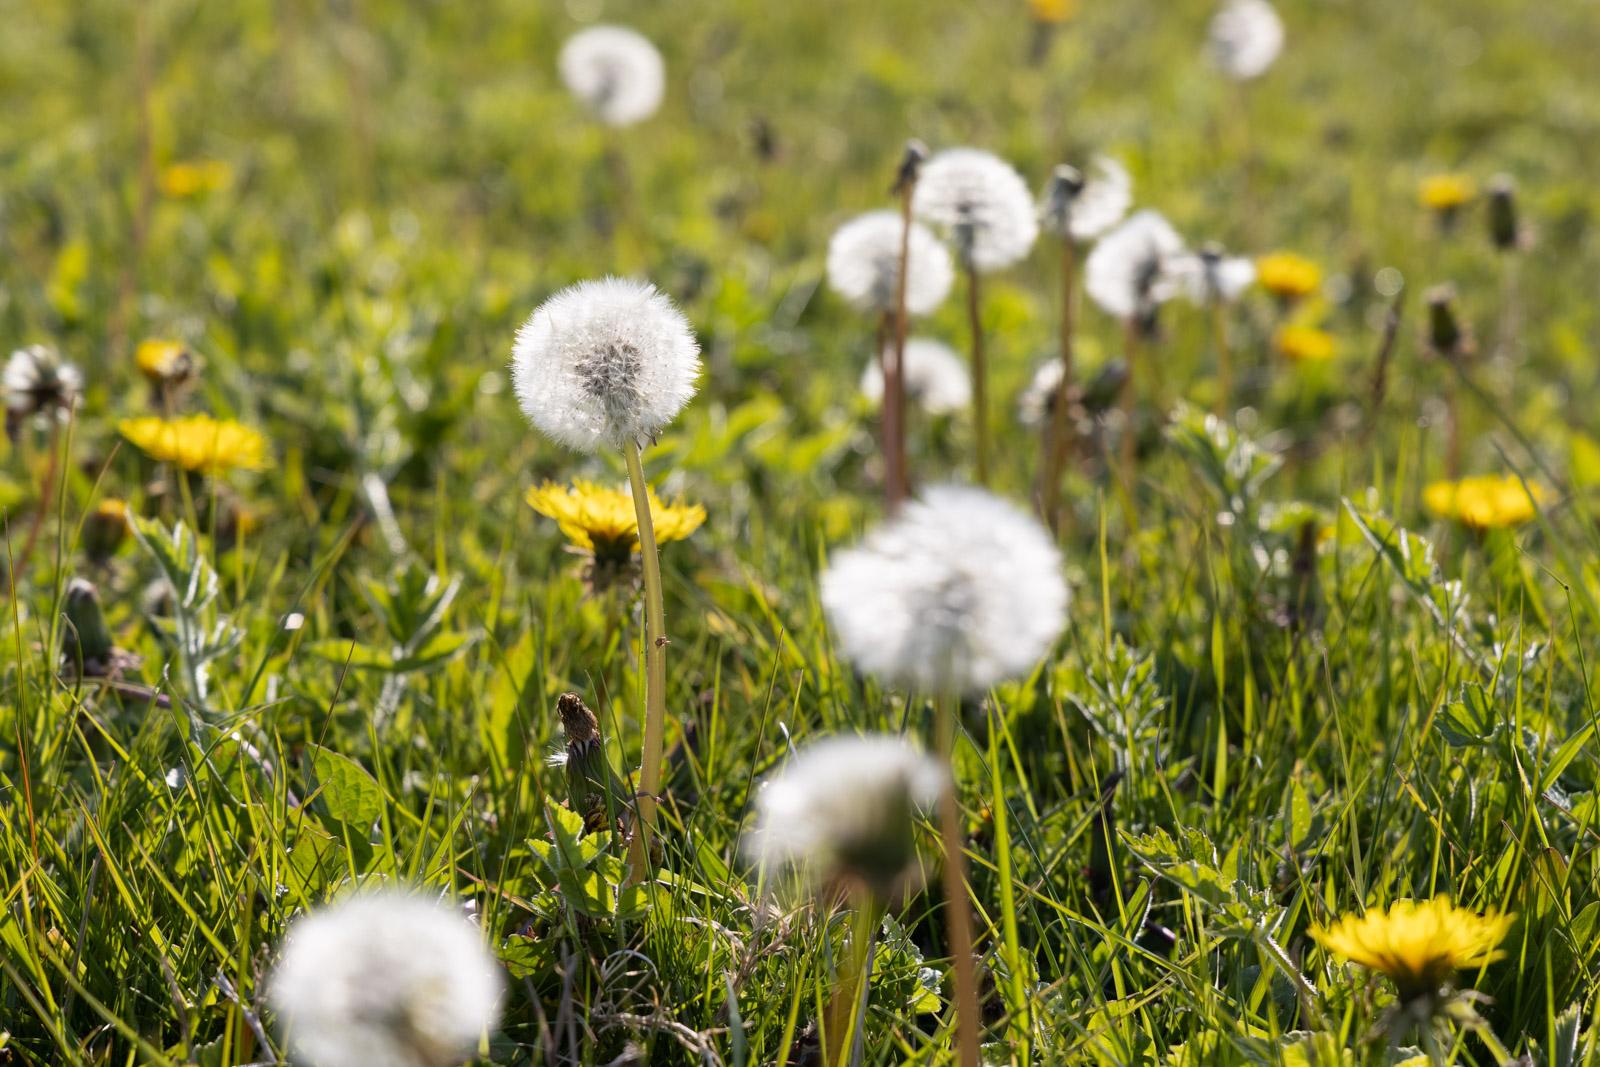 Dandelions - Bagley, Somerset, UK. ID BR53716